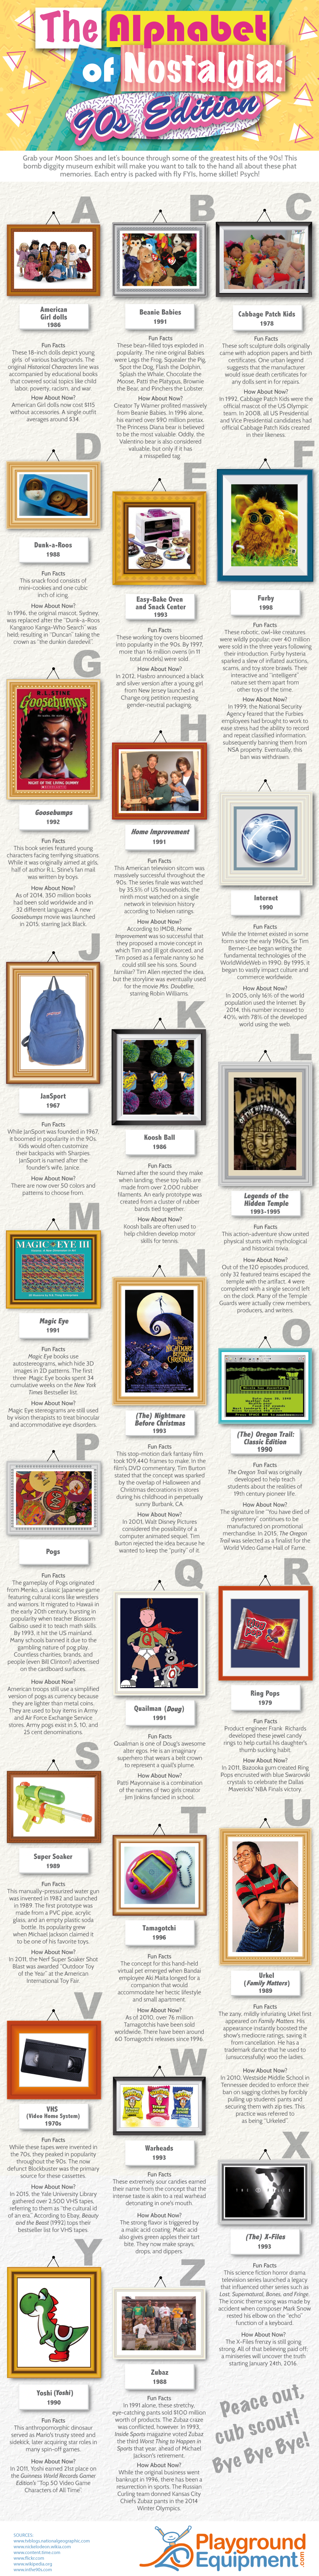 Alphabet of Nostalgia: 90s Edition